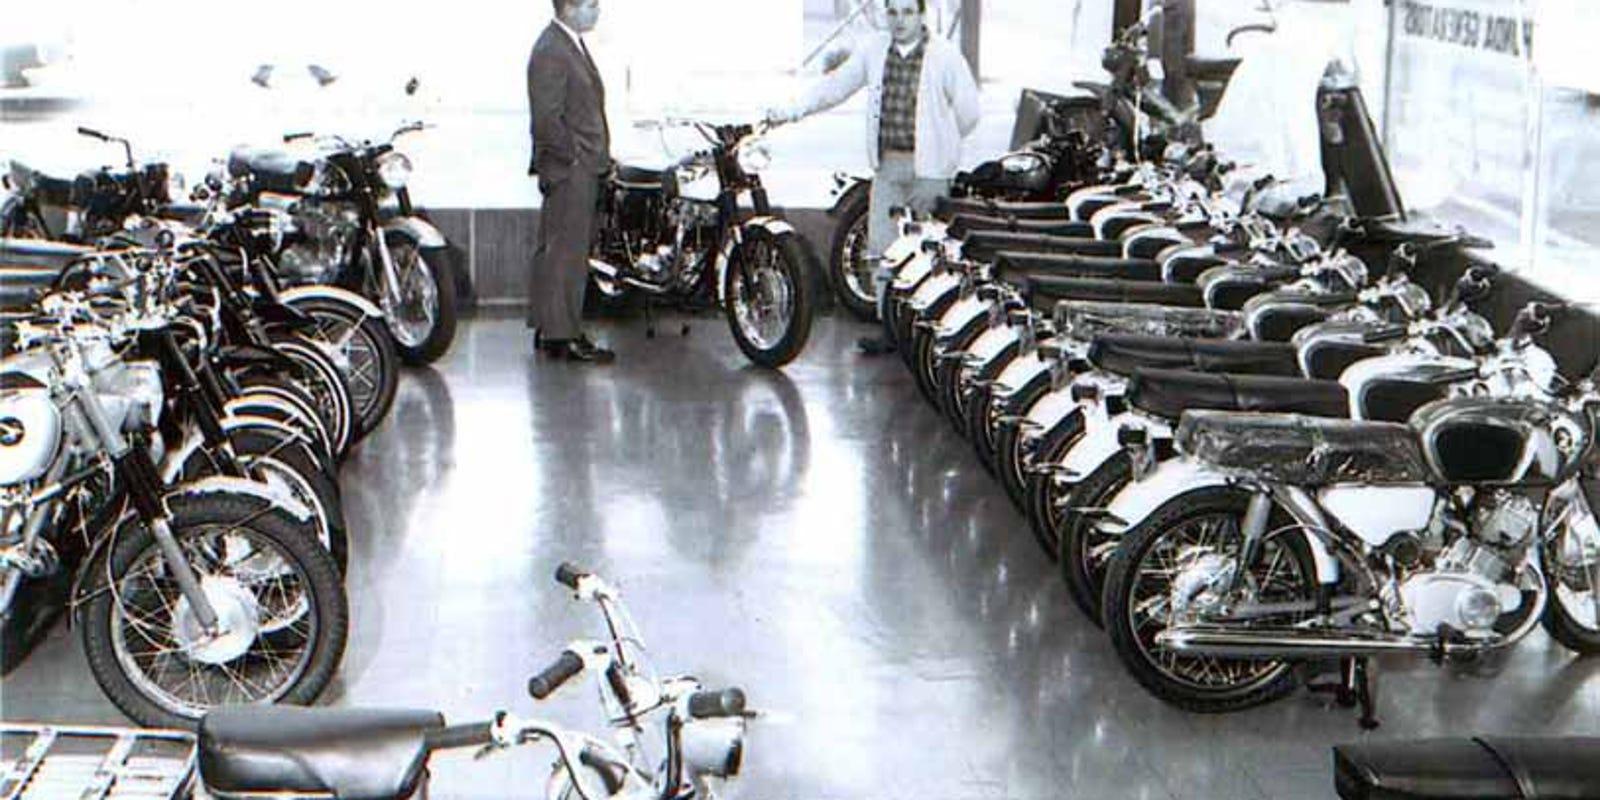 Beaverton Honda Service >> Beaverton Car Dealer Bob Lanphere Sr Dies At 81